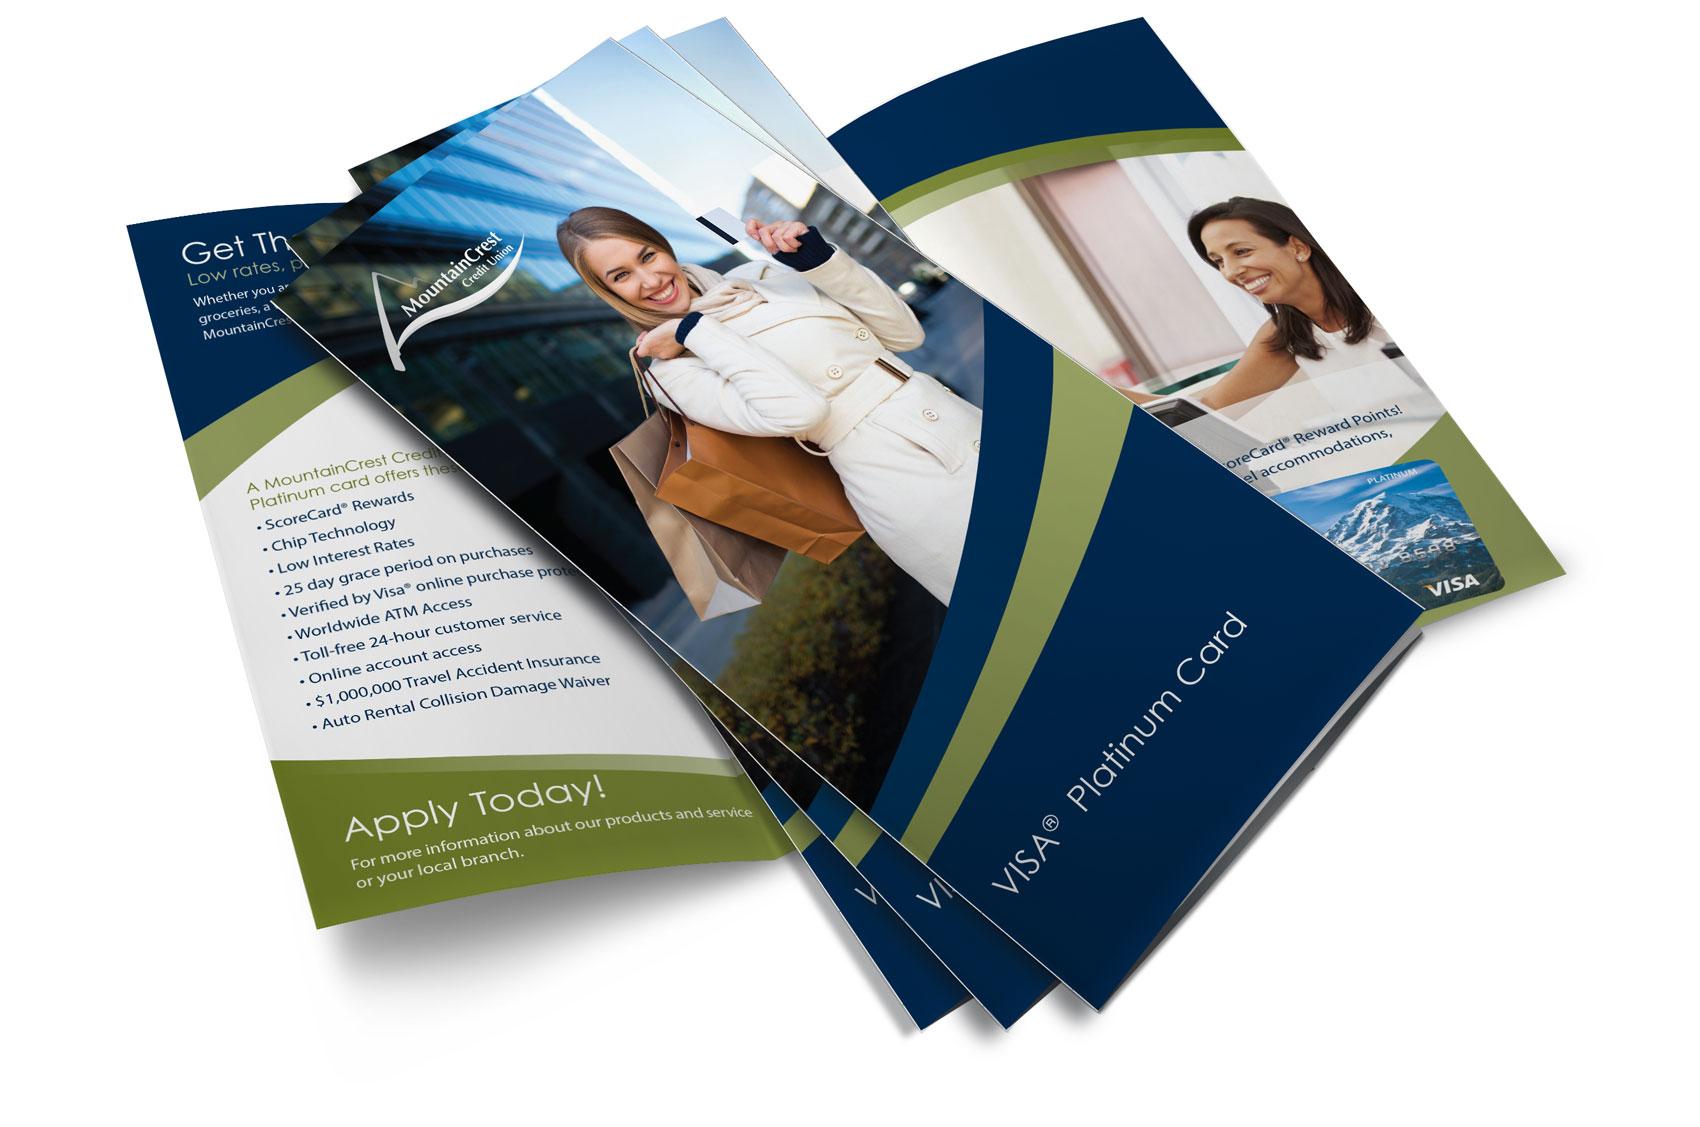 Brochure Design for MountainCrest Credit Union